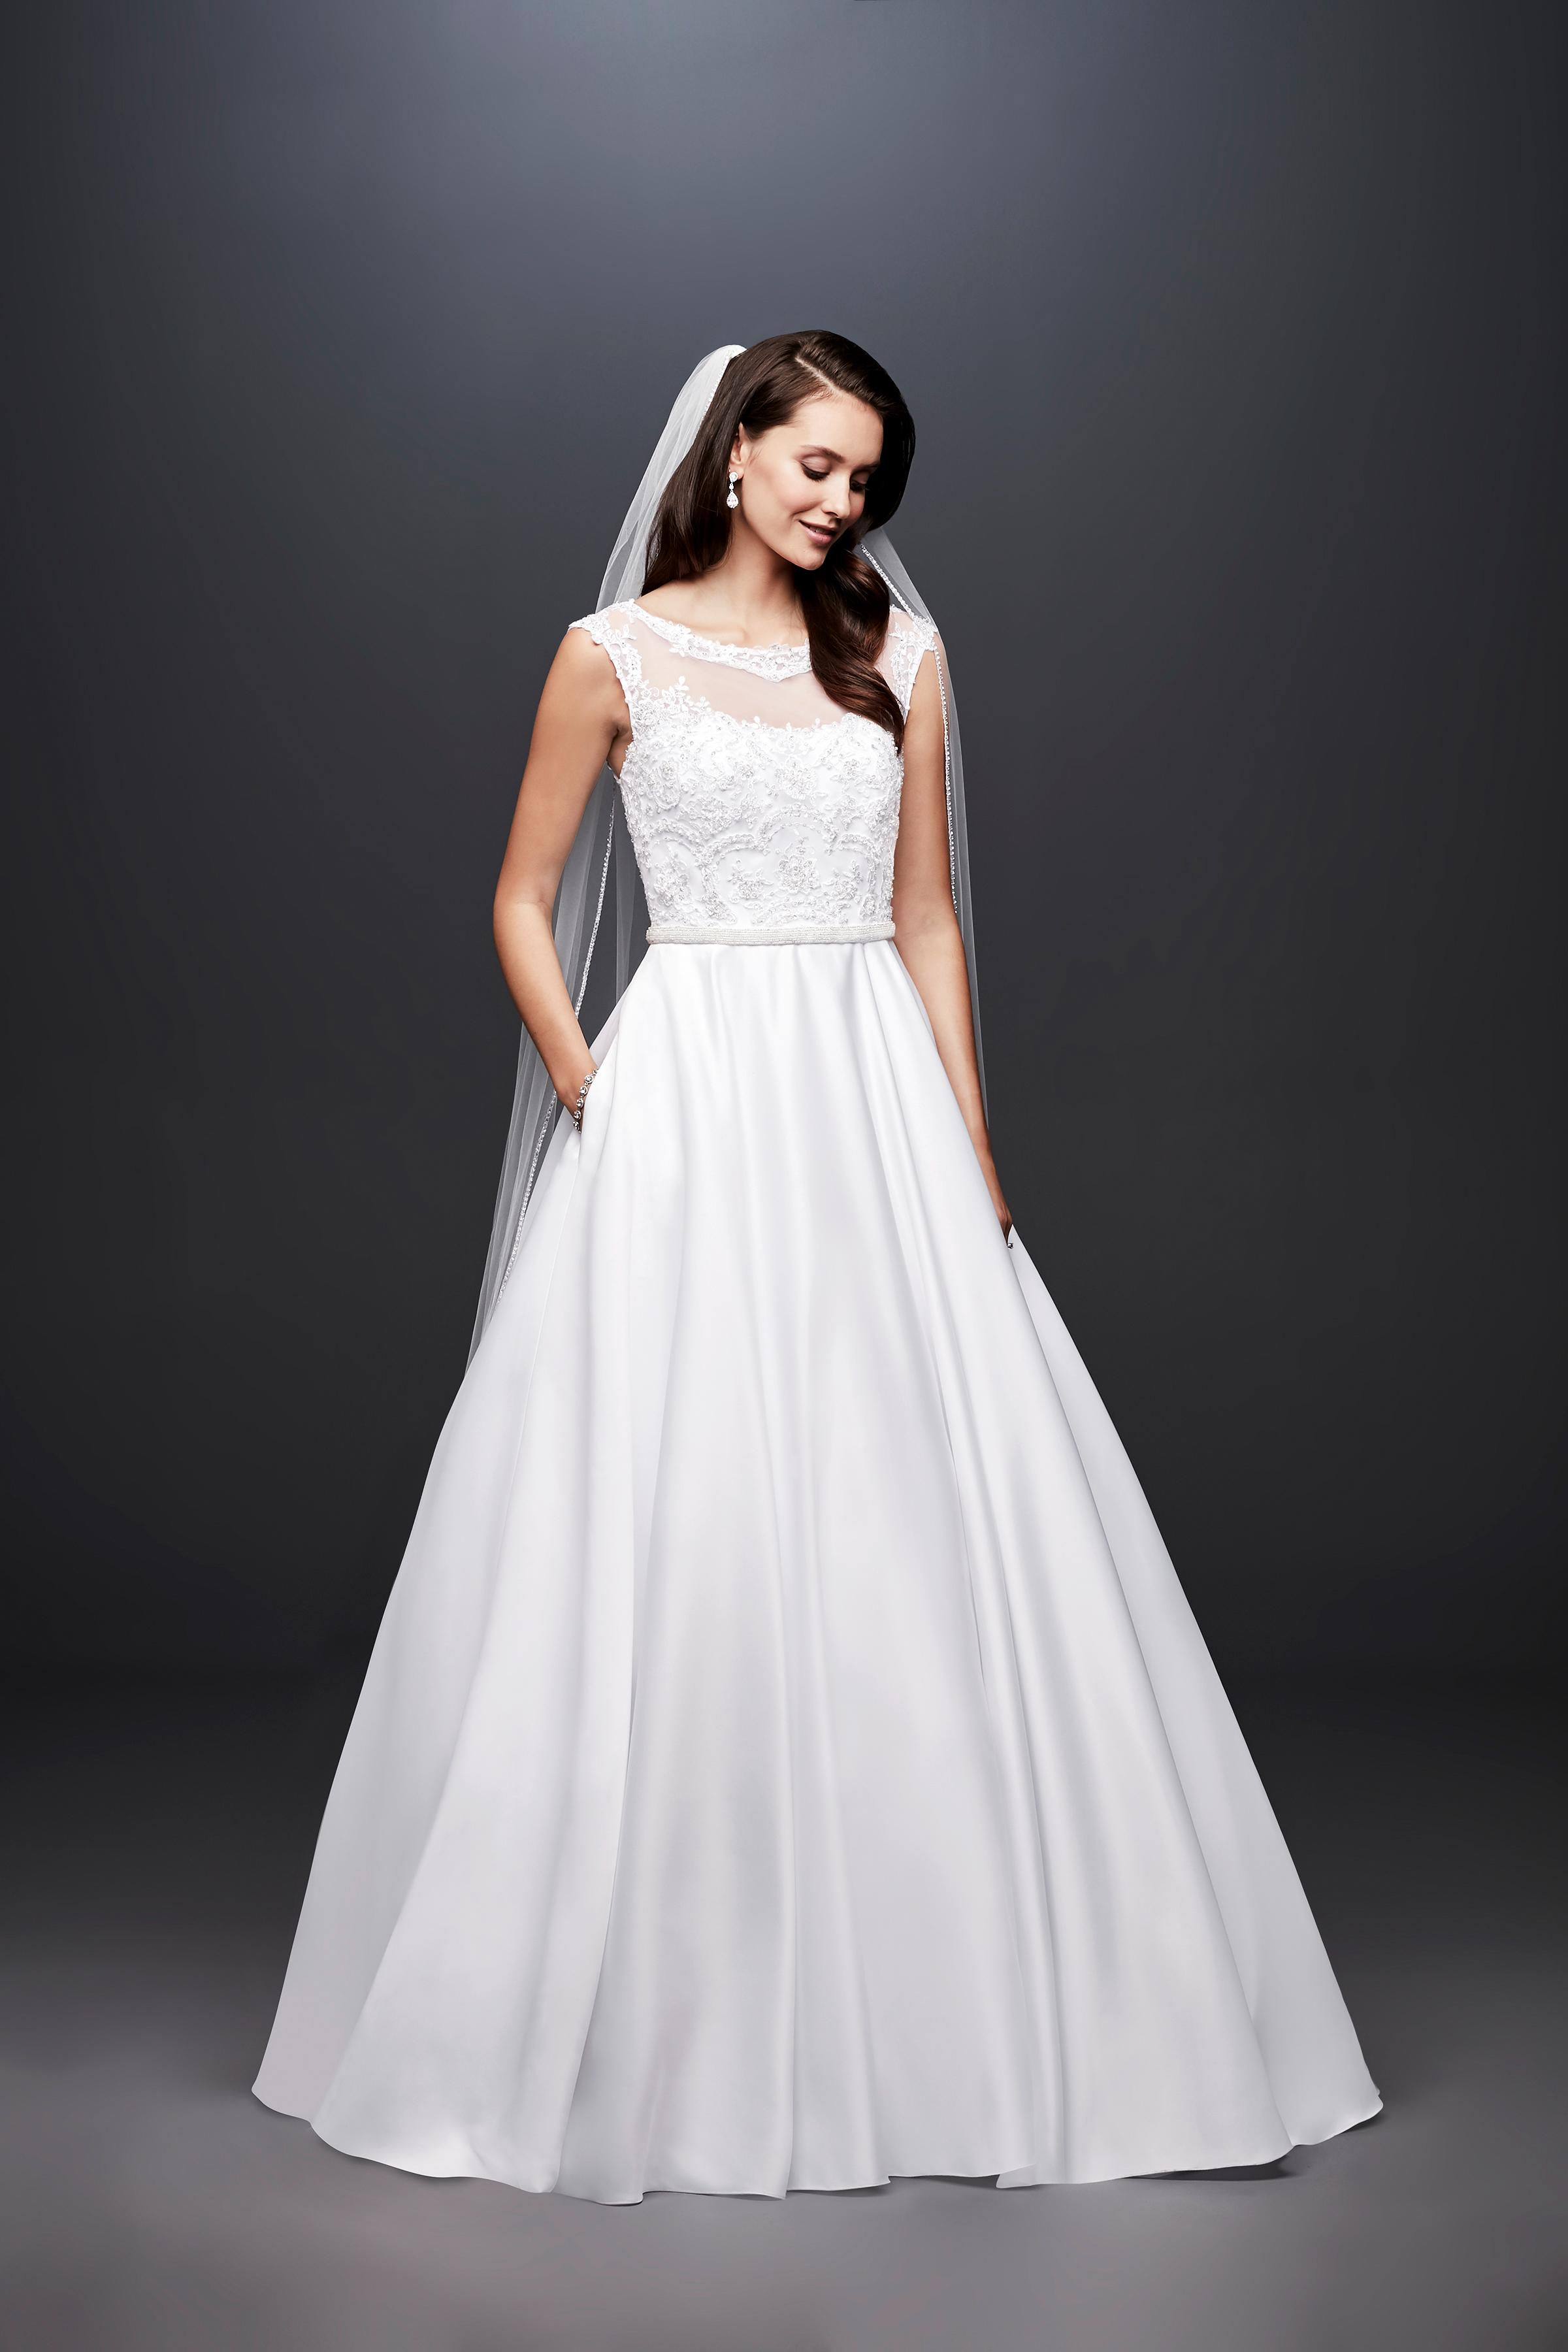 david bridal wedding dress spring 2019 cap sleeves illusion neckline a-line